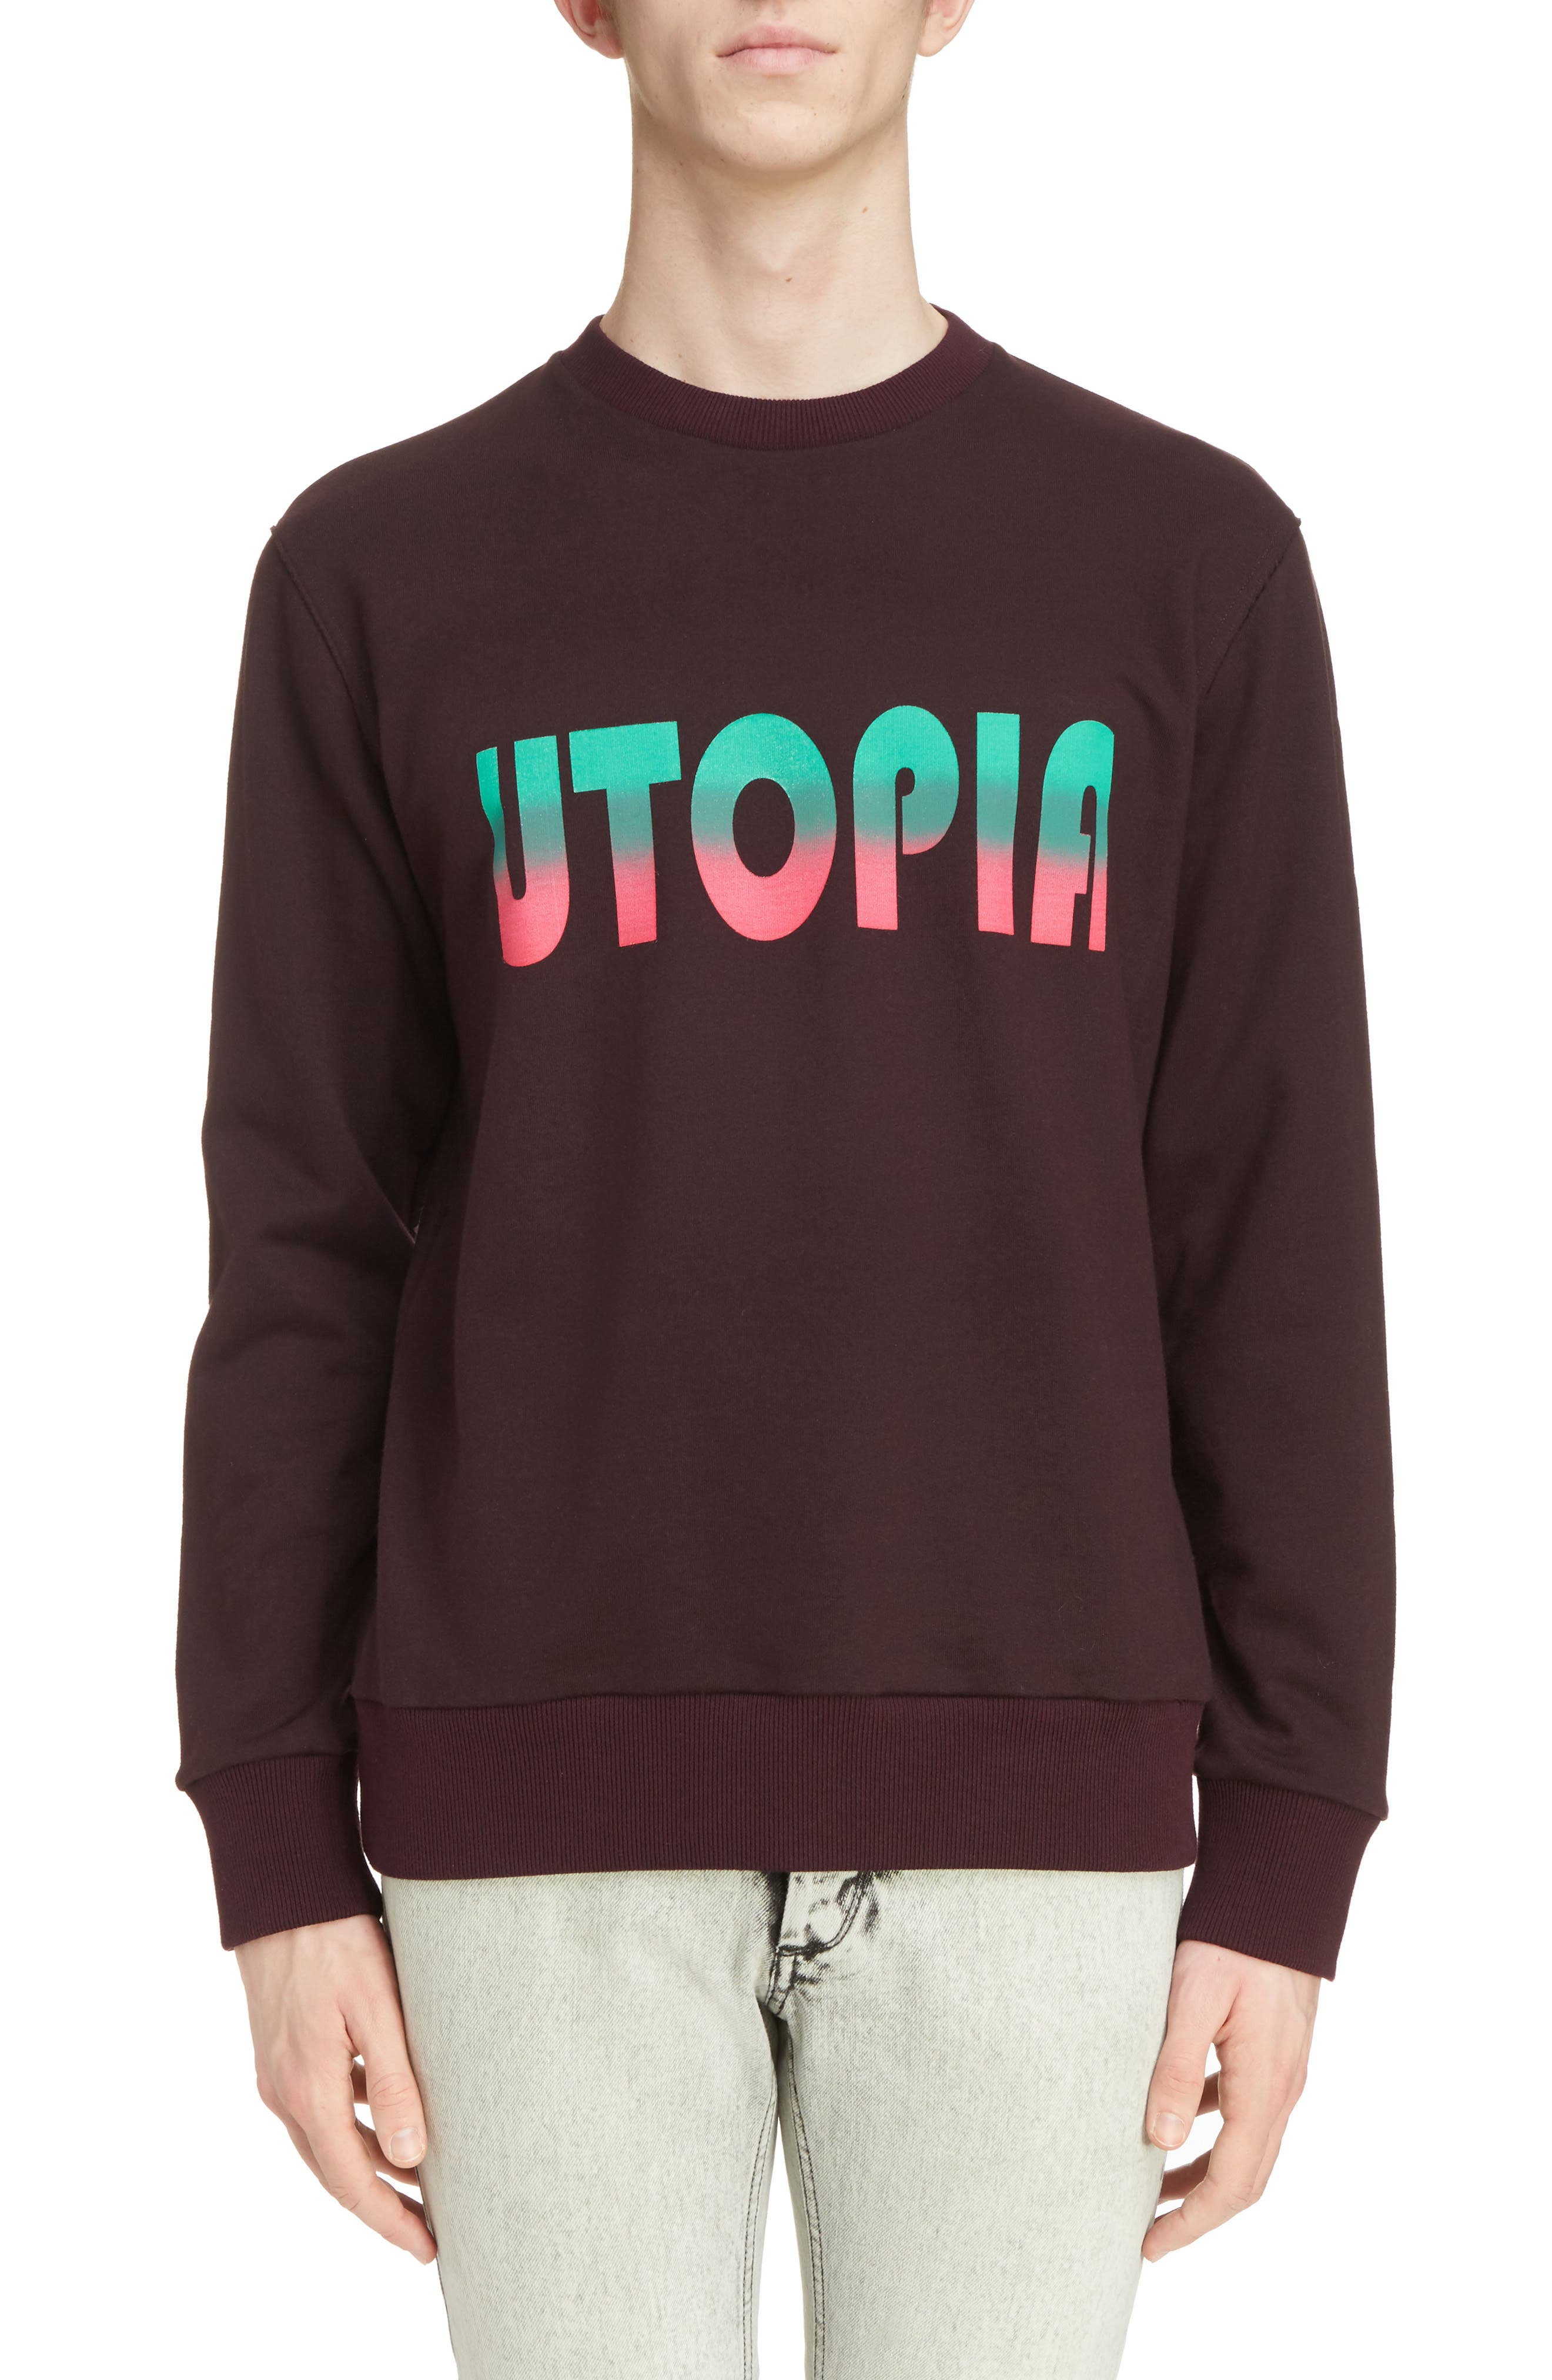 Utopia Graphic Crewneck Sweatshirt,                             Main thumbnail 1, color,                             930